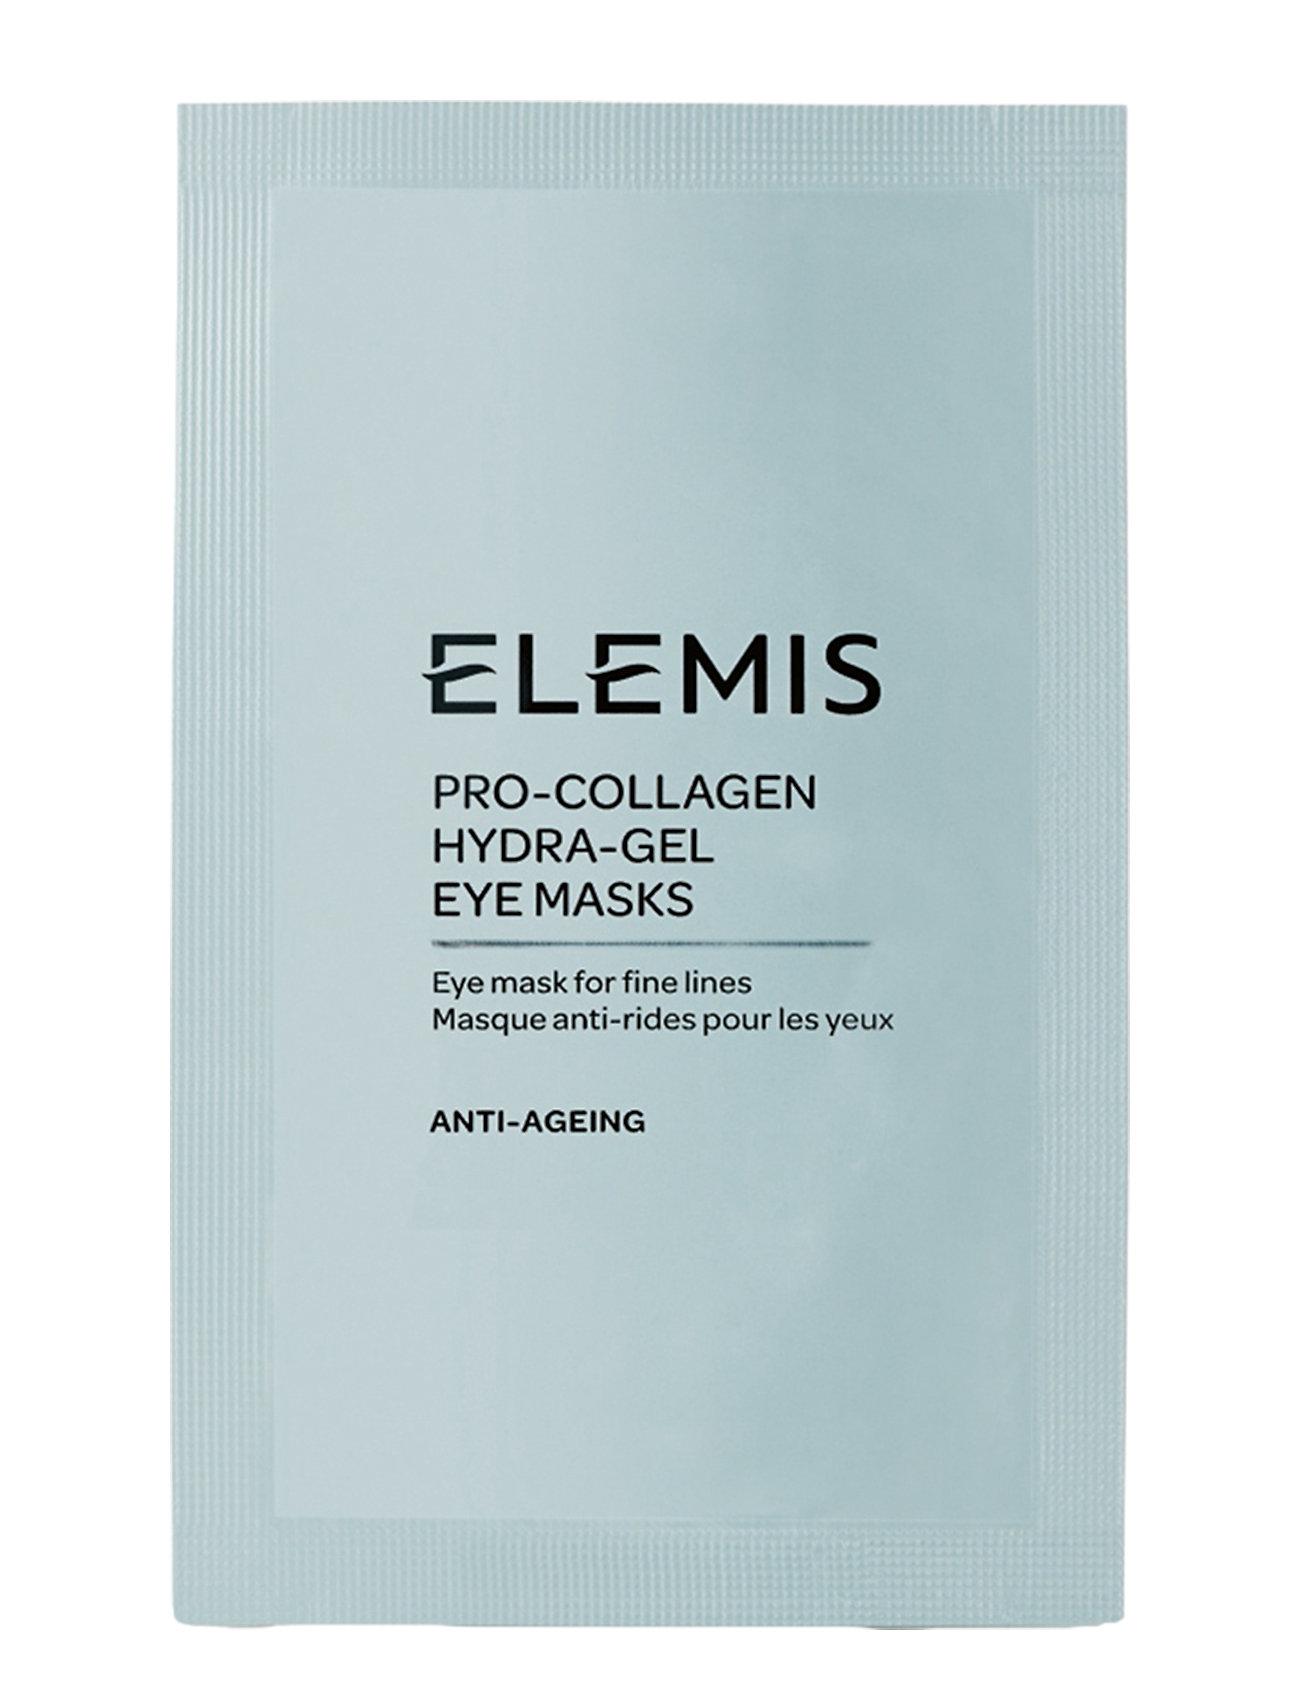 Elemis Pro-Collagen Hydra-Gel Eye Mask - CLEAR